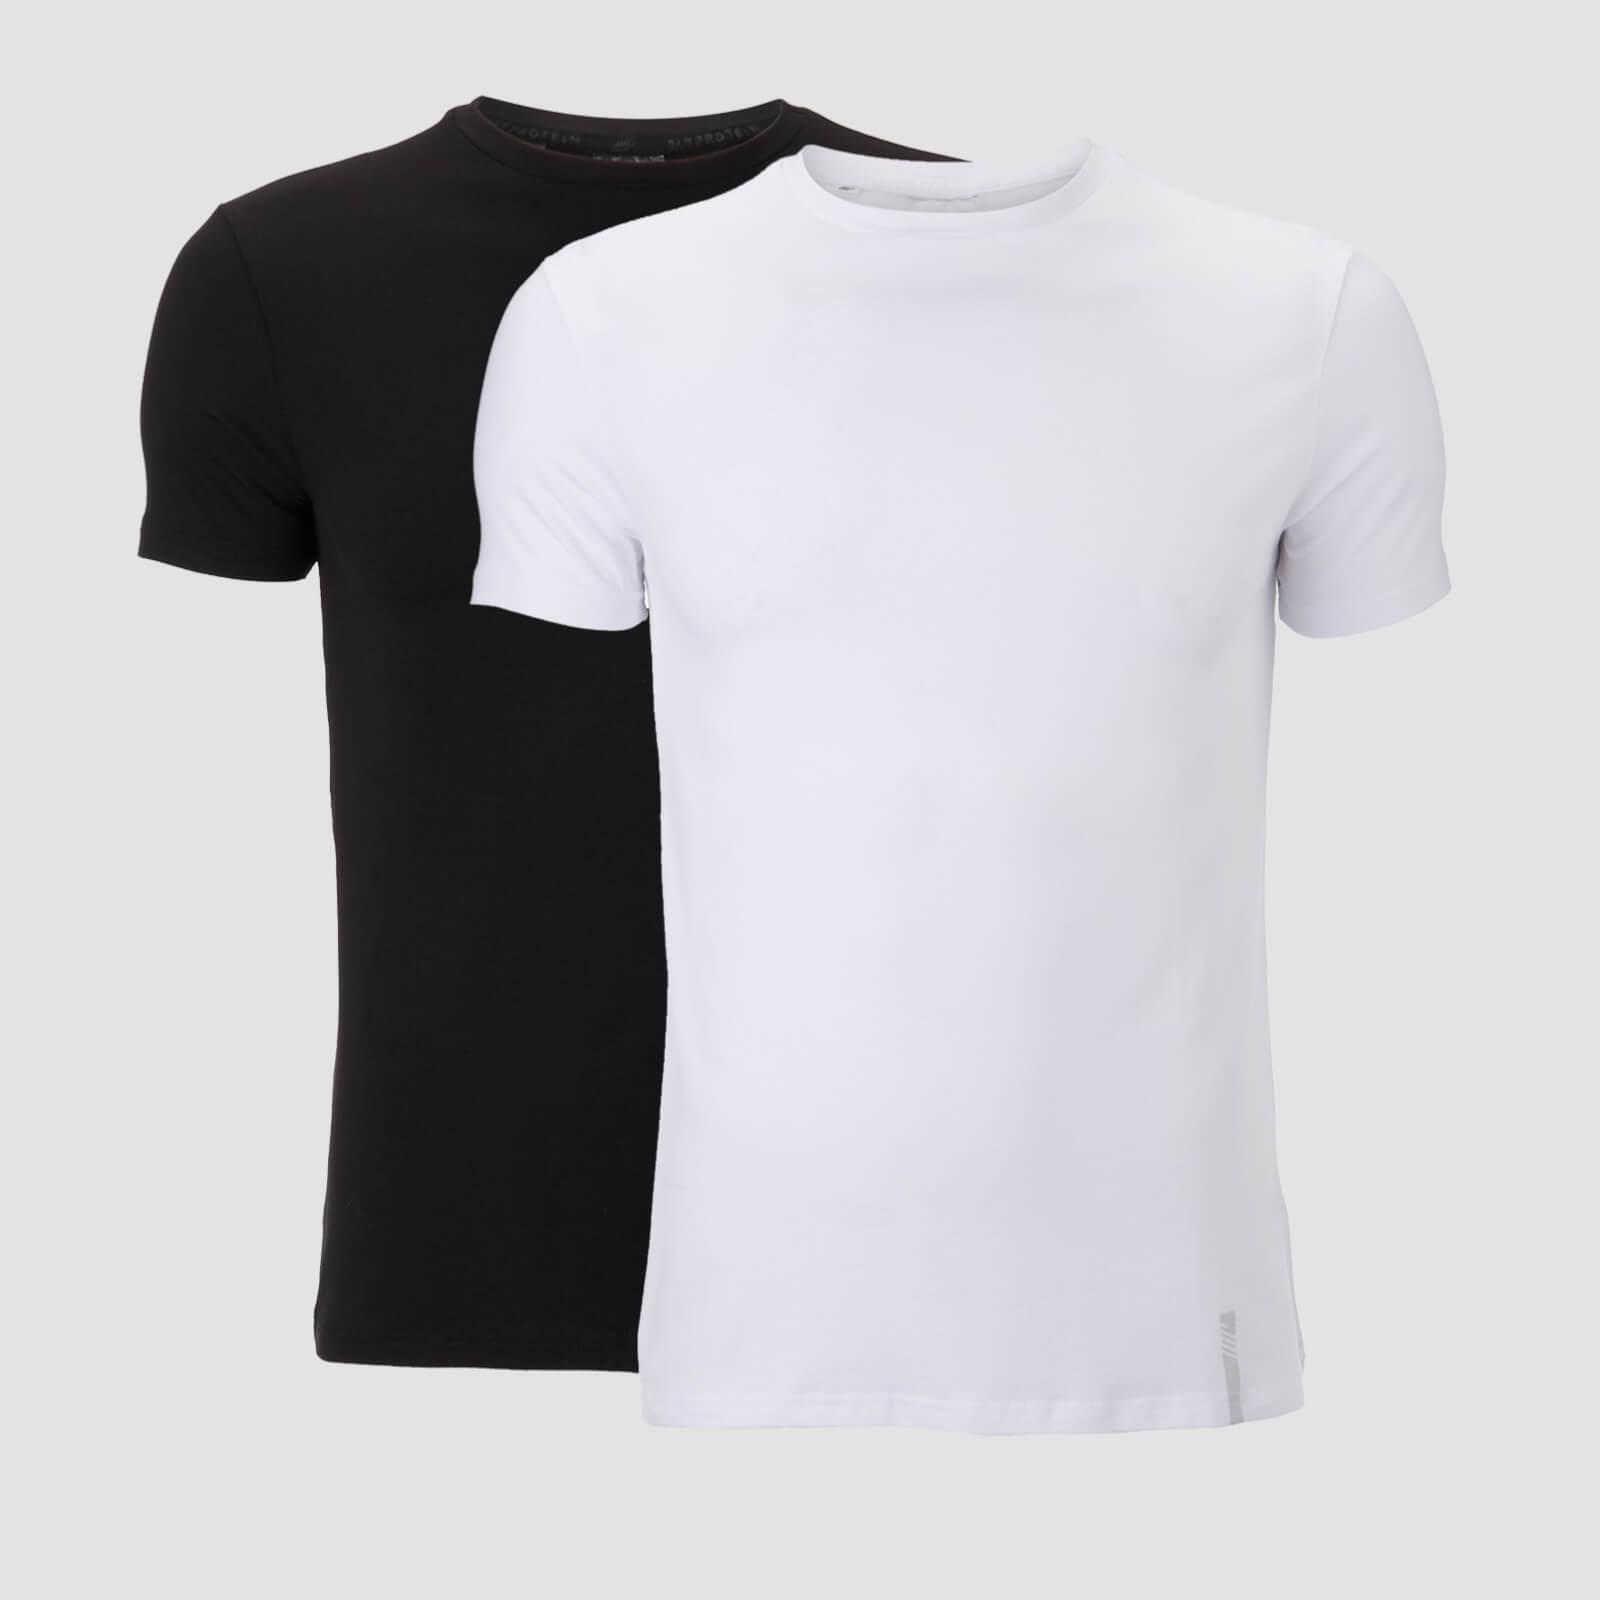 MP Men's Luxe Classic Crew T-Shirt - Black/White (2 Pack) - M